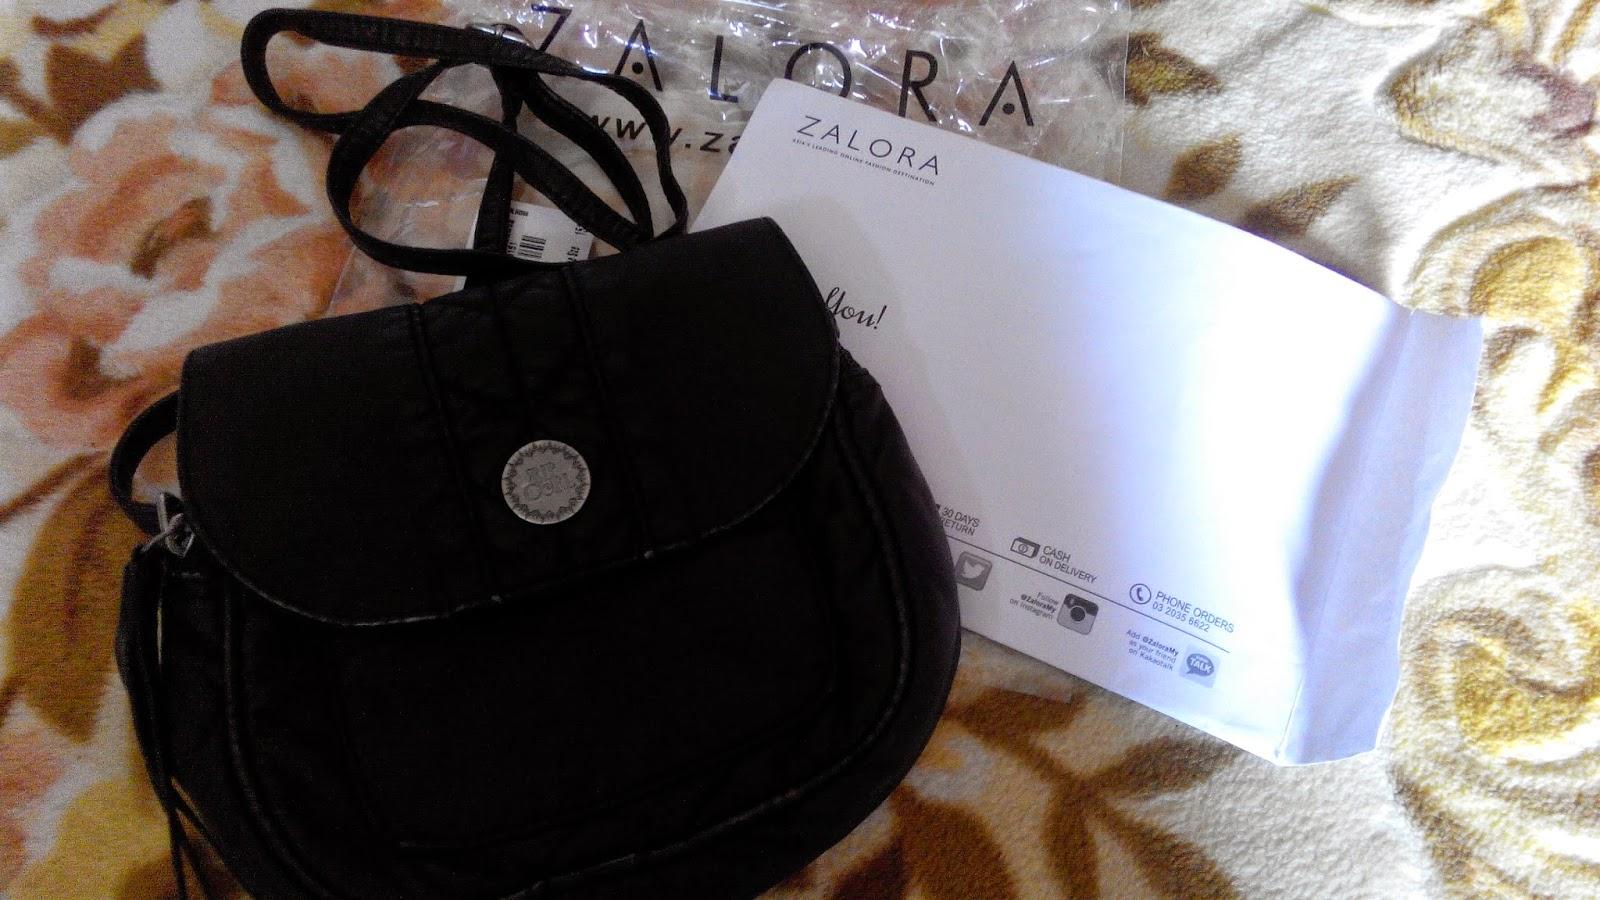 Handbag dari Zalora.com.my